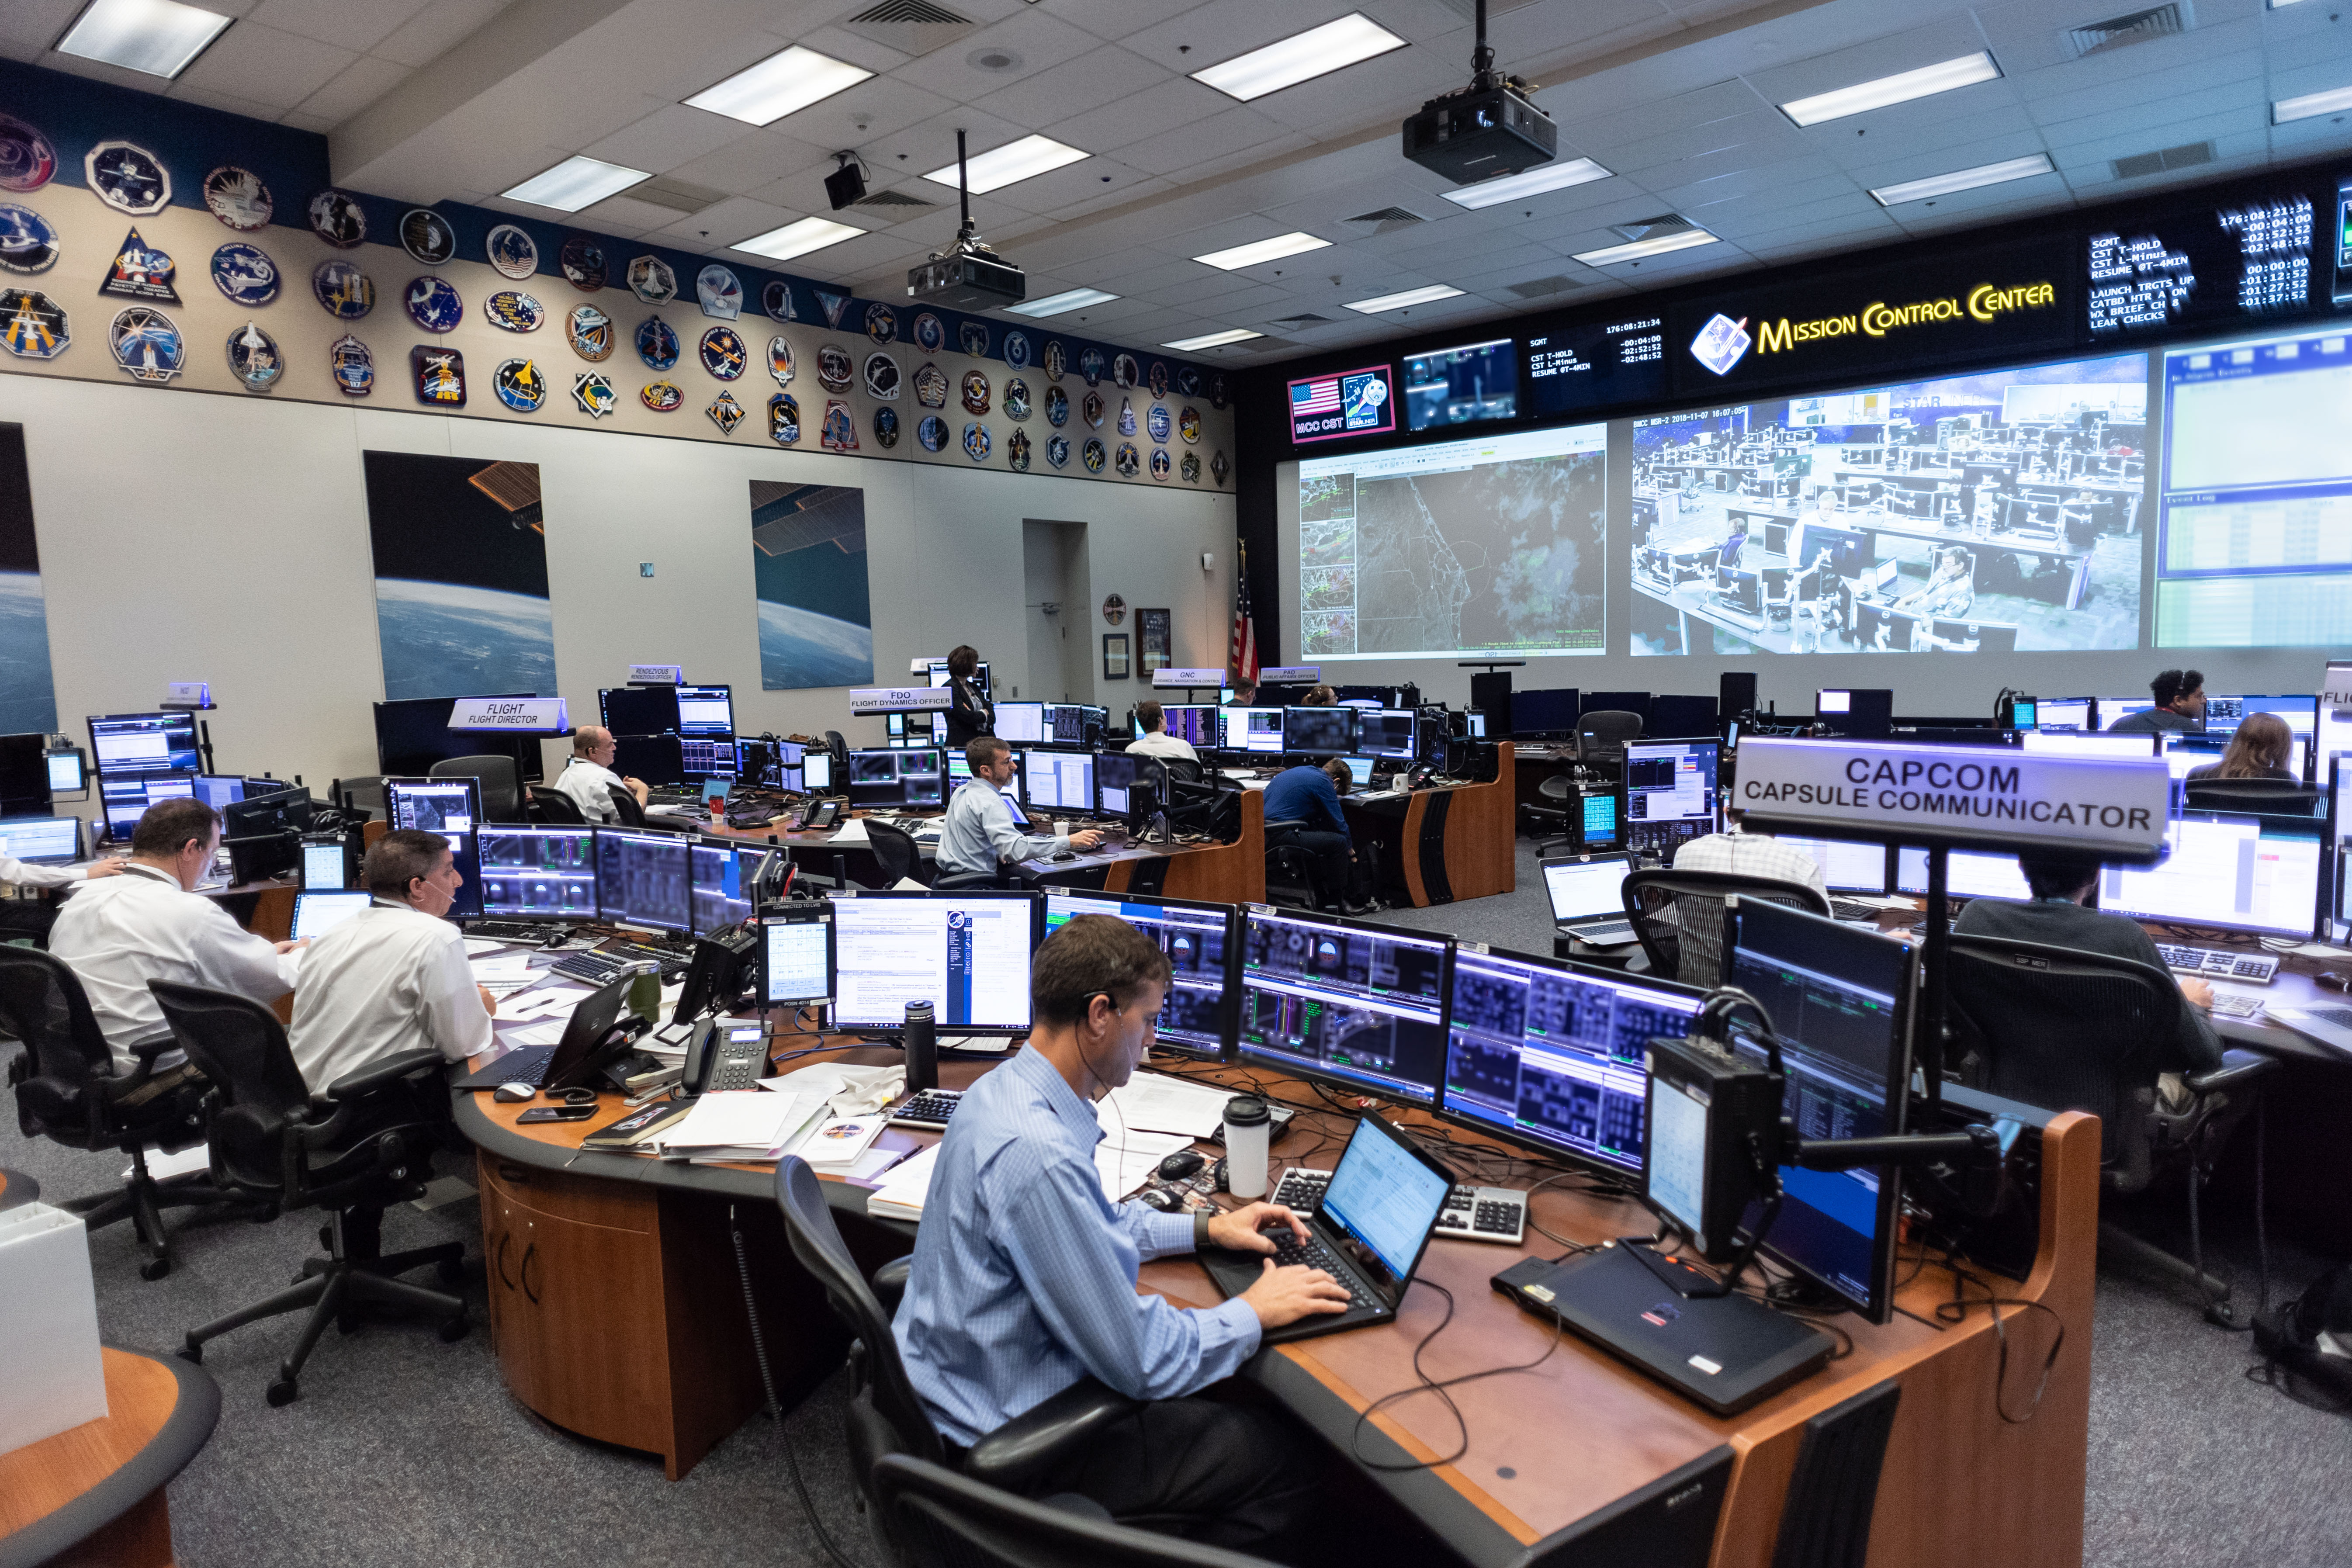 Launch Teams Simulate Boeing Uncrewed Flight Test Prelaunch Procedures – Commercial Crew Program